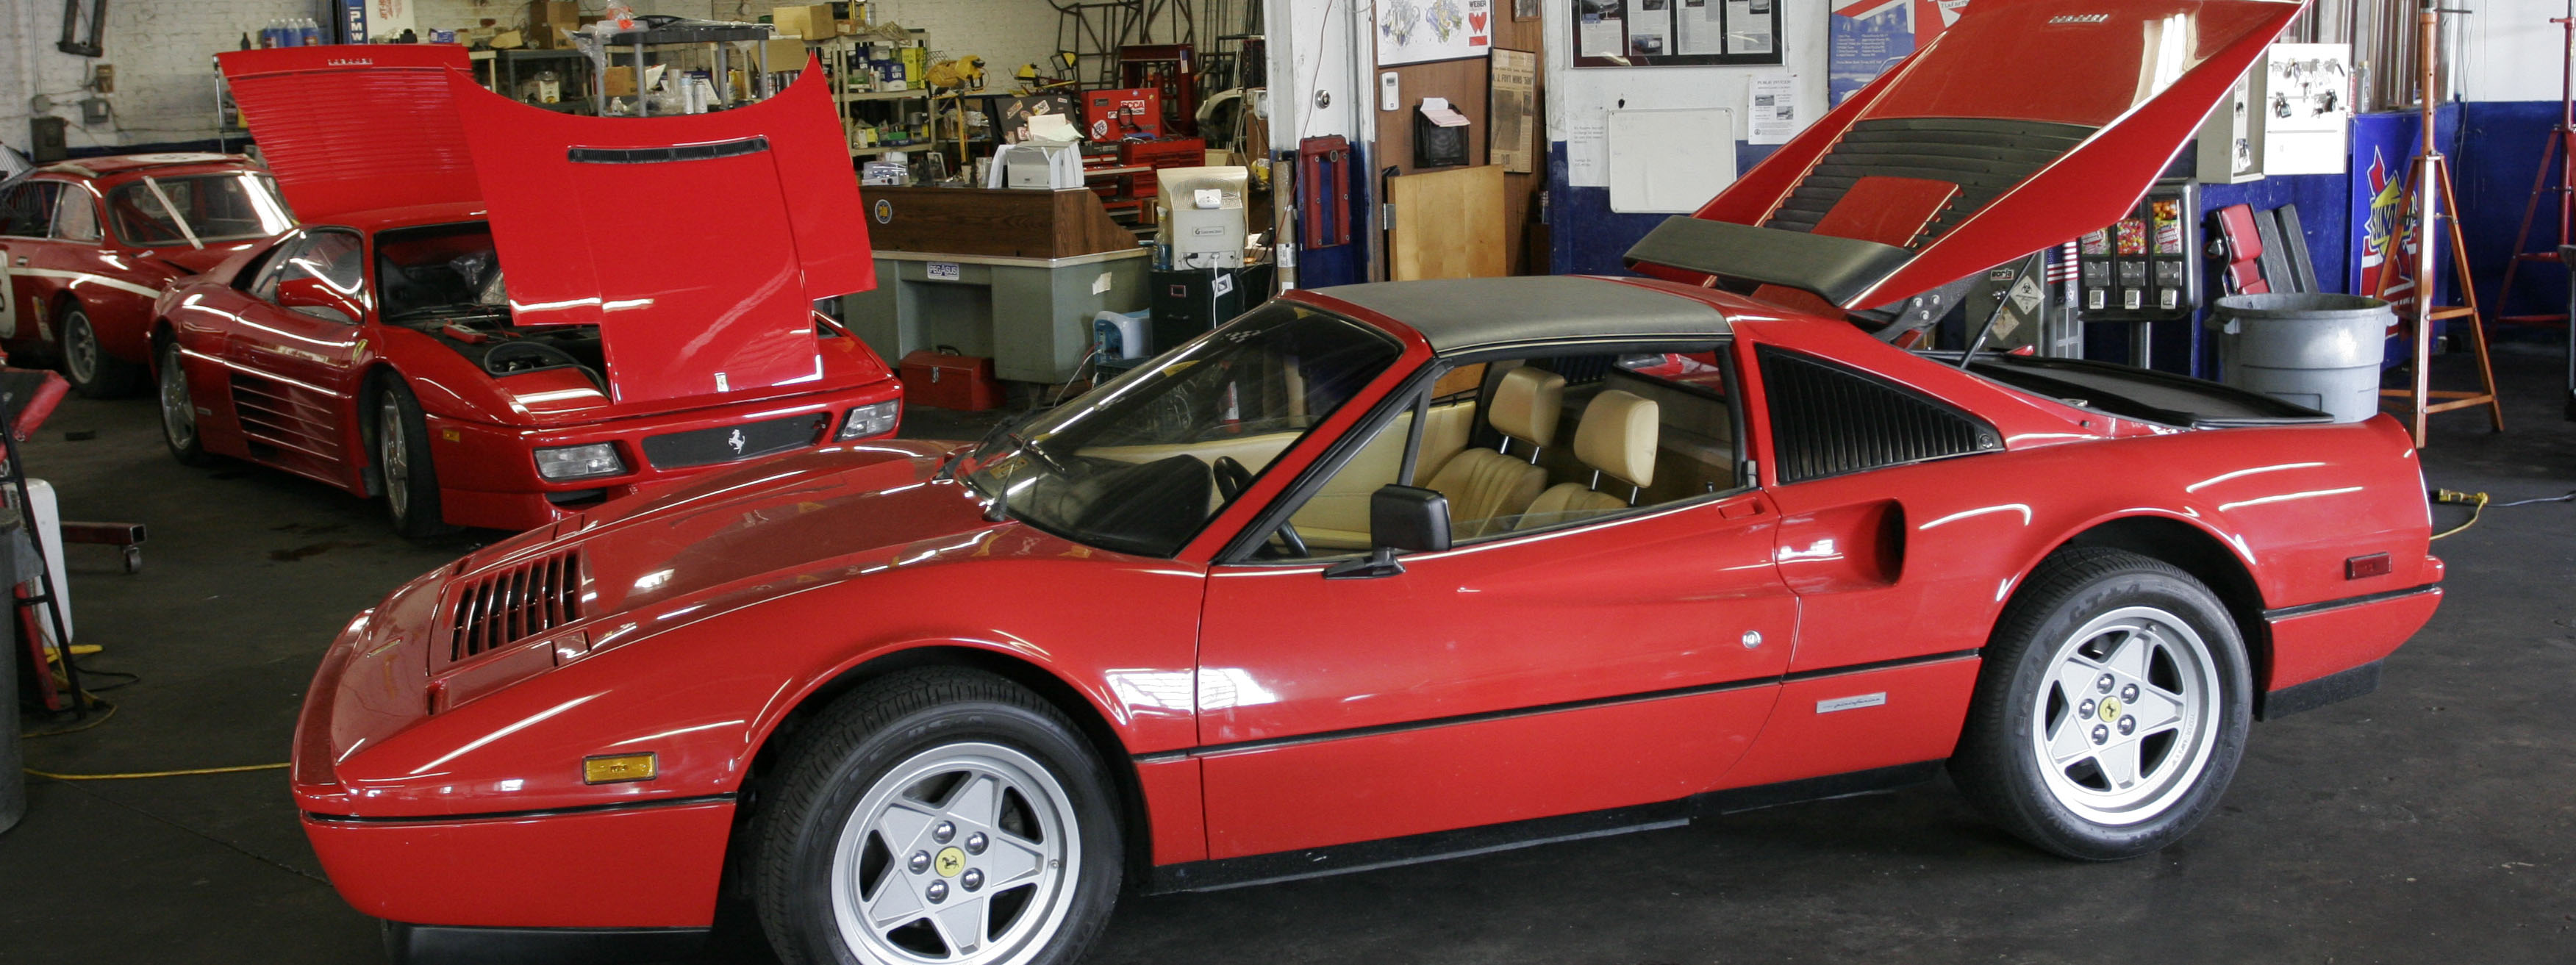 4037821211_a4671ce122_o1 Marvelous Ferrari Mondial 8 Te Koop Cars Trend